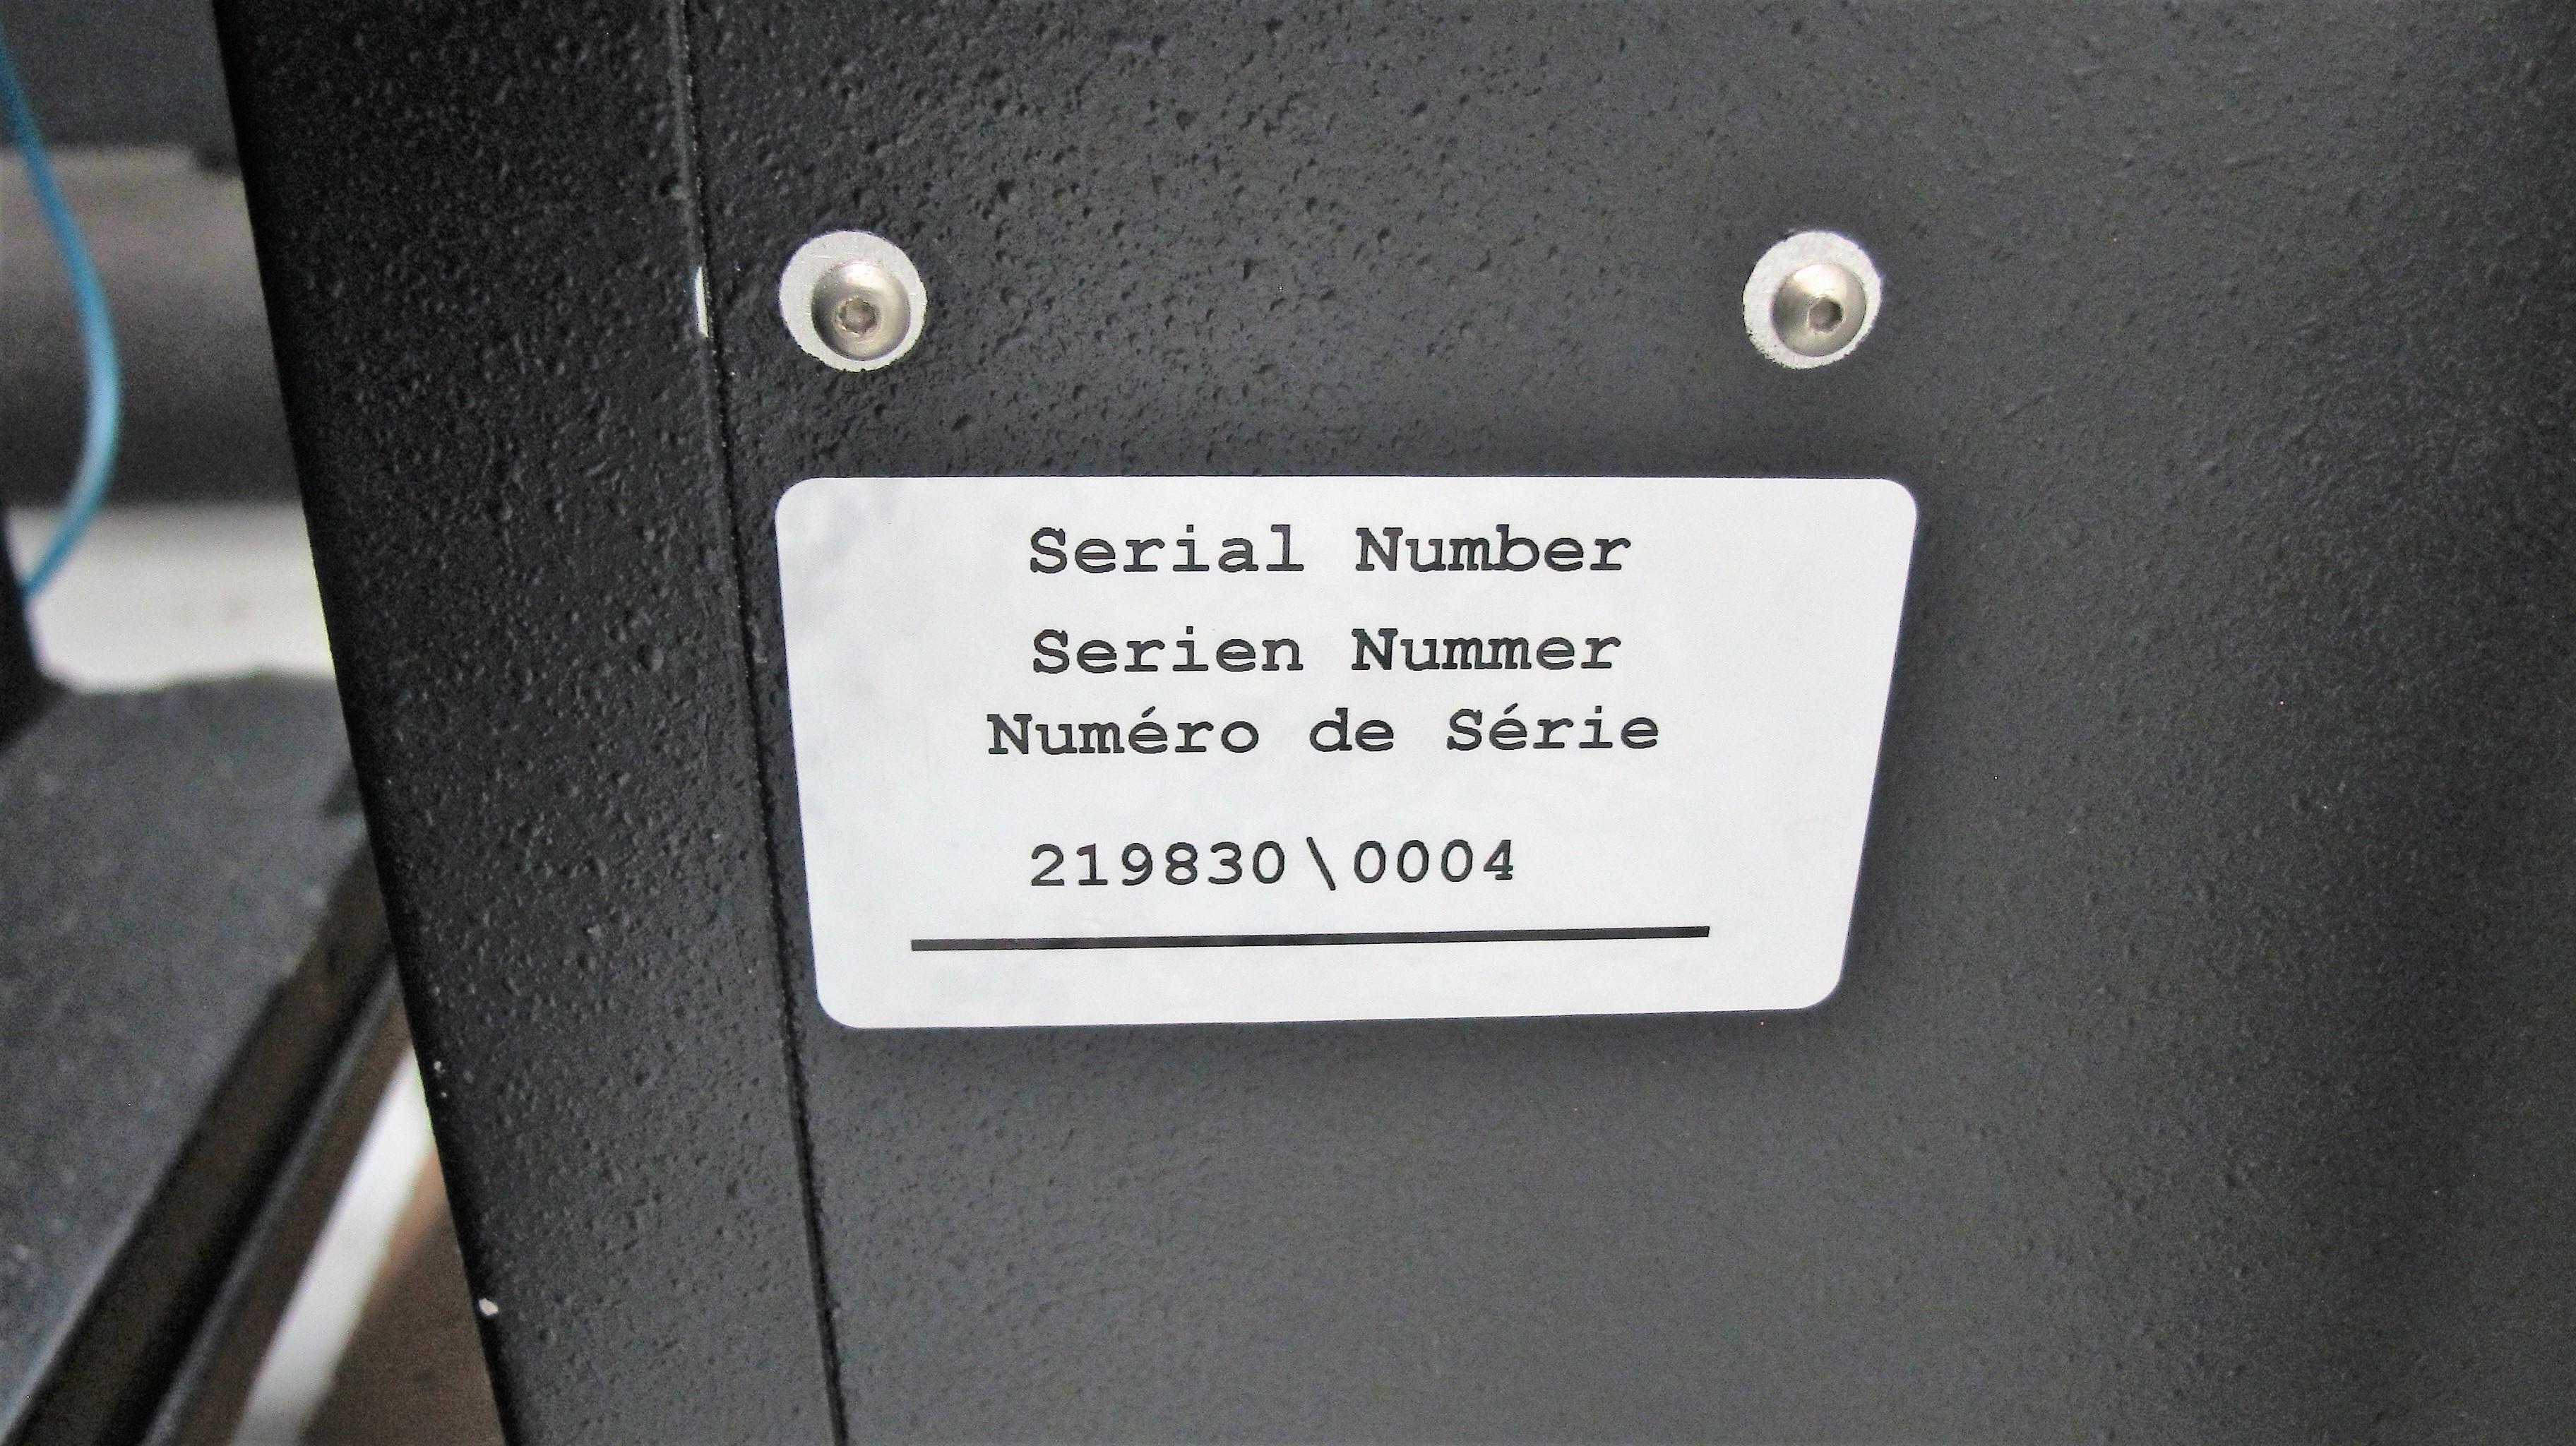 Lot 6 - 1999 DEA DEA2203 CMM, S/N 2203-185 W/BROWN & SHARPE POWER SUPPLY 219830\0004, RENISHAW PH10M